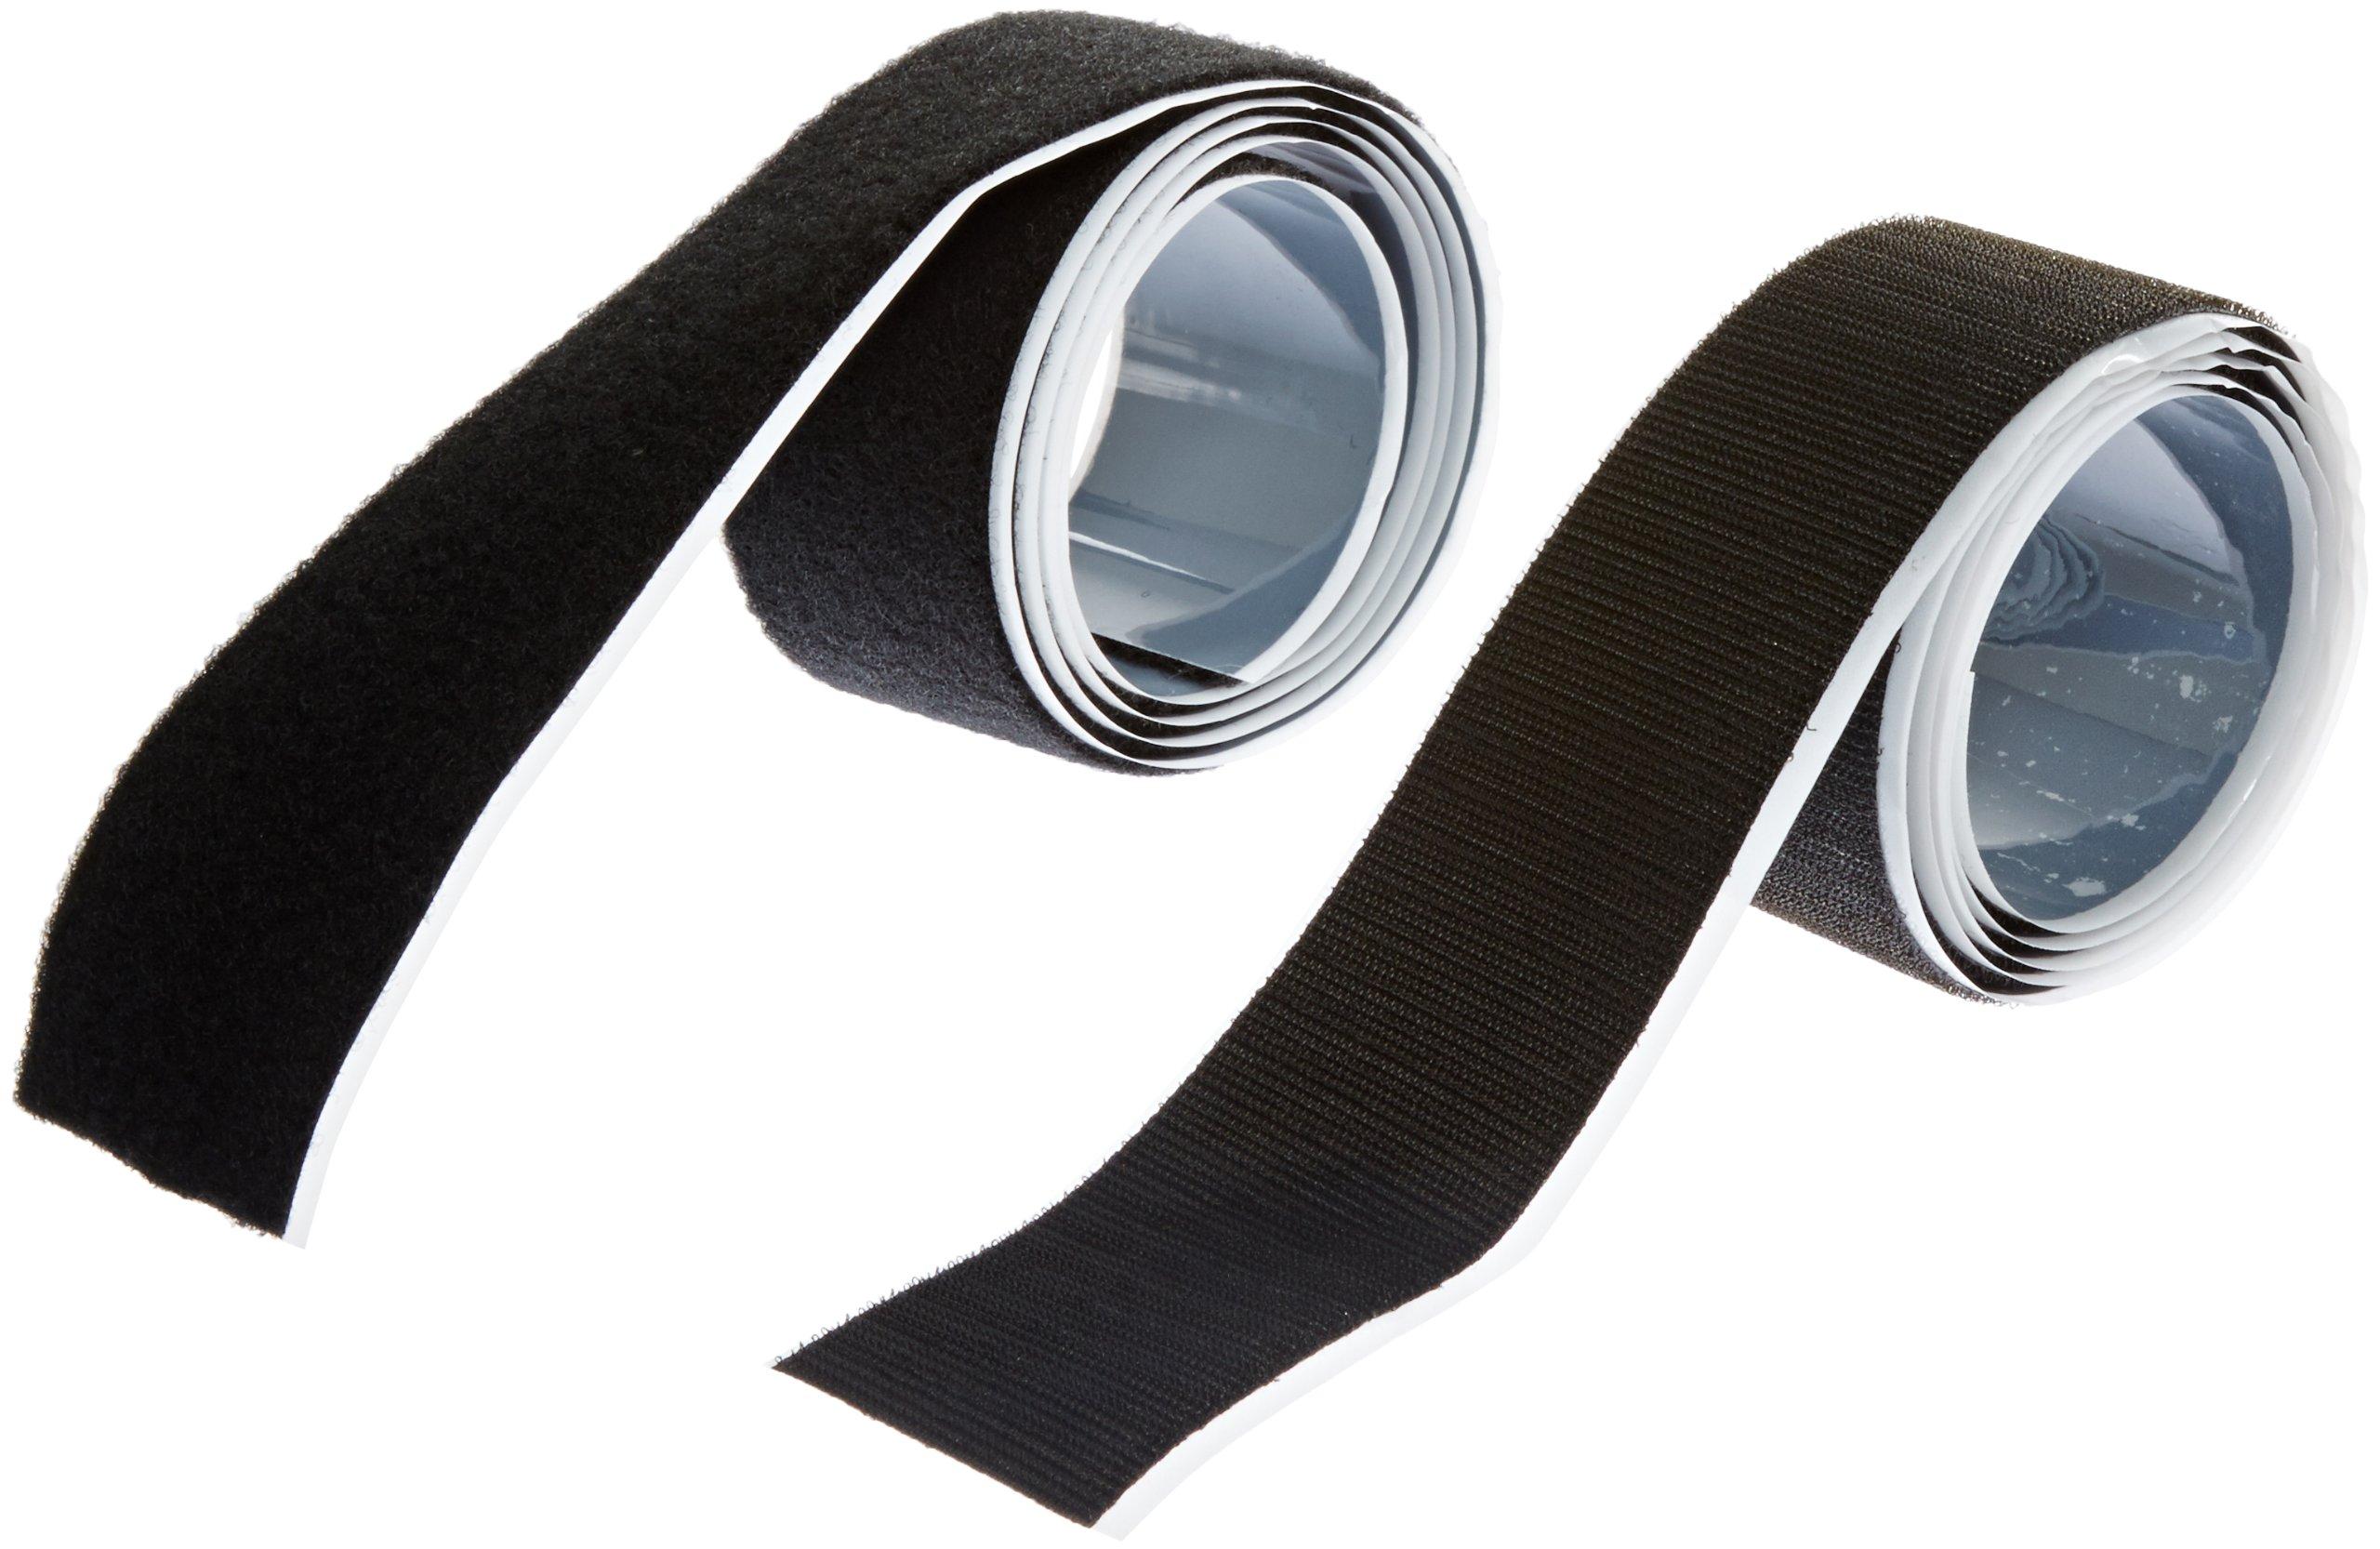 VELCRO 3806-SAT-PSA/B Black Super Adhesive Nylon Hook and Loop Combo Pack, 0132 Adhesive Backed, 2'' Wide, 5' Length